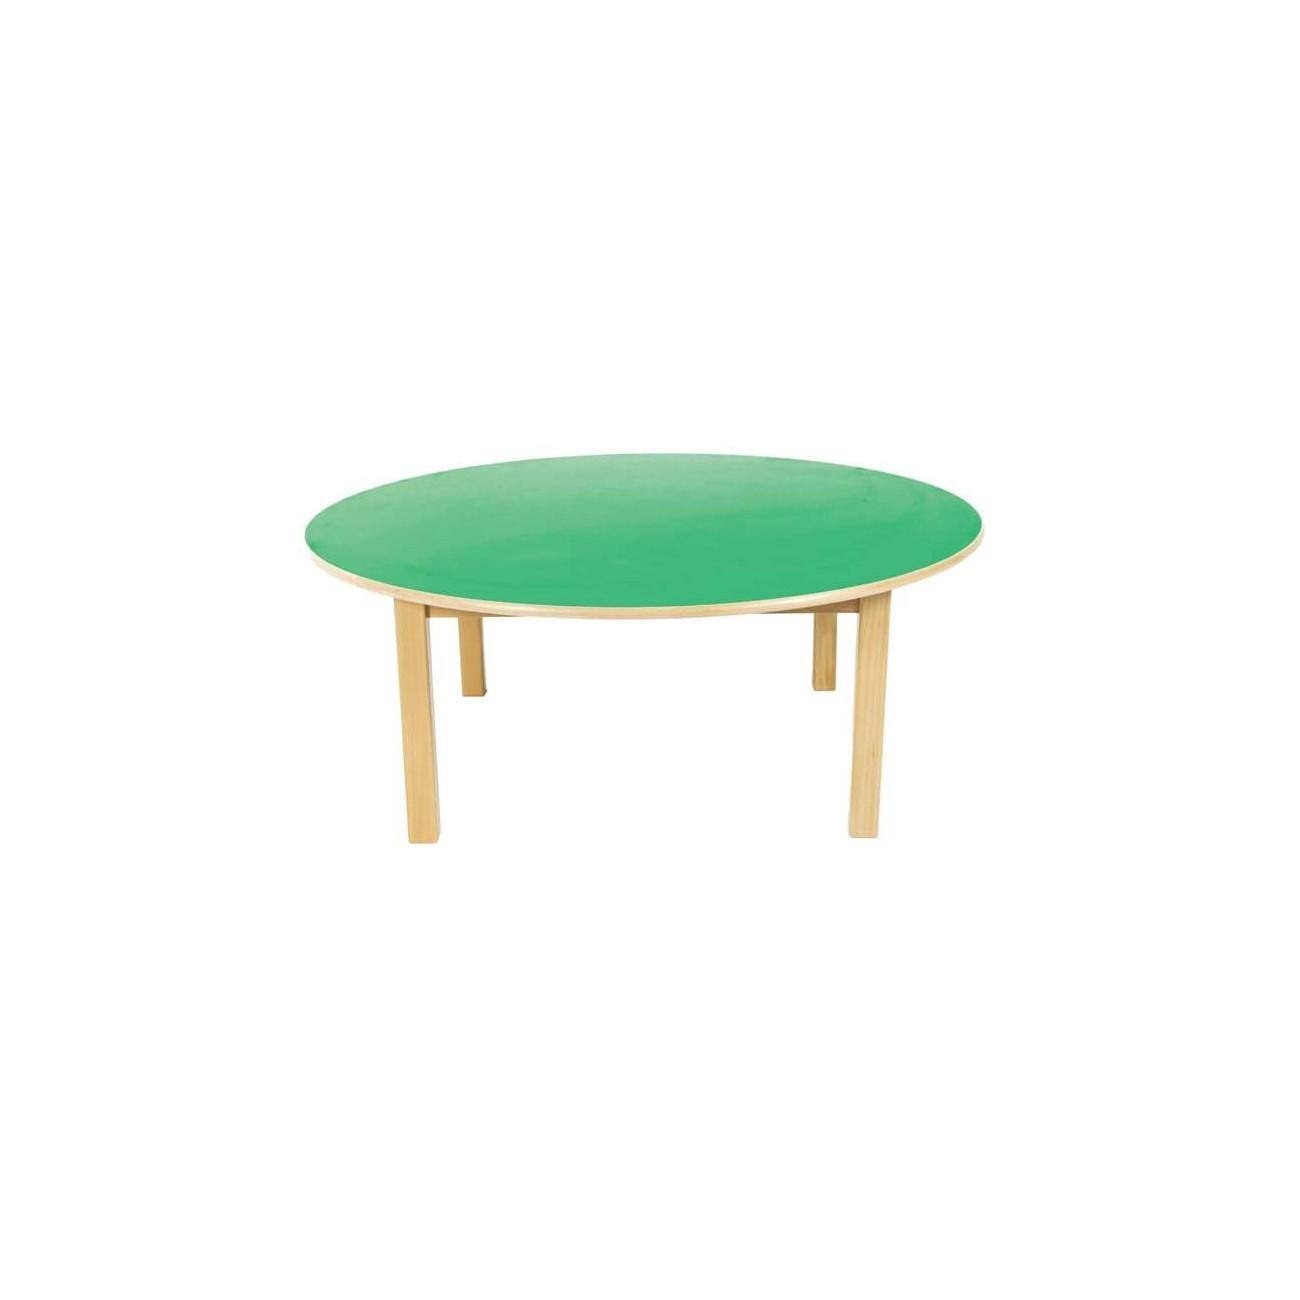 Mesas de madera redondas beautiful mesas de madera redondas with mesas de madera redondas - Mesa madera redonda ...